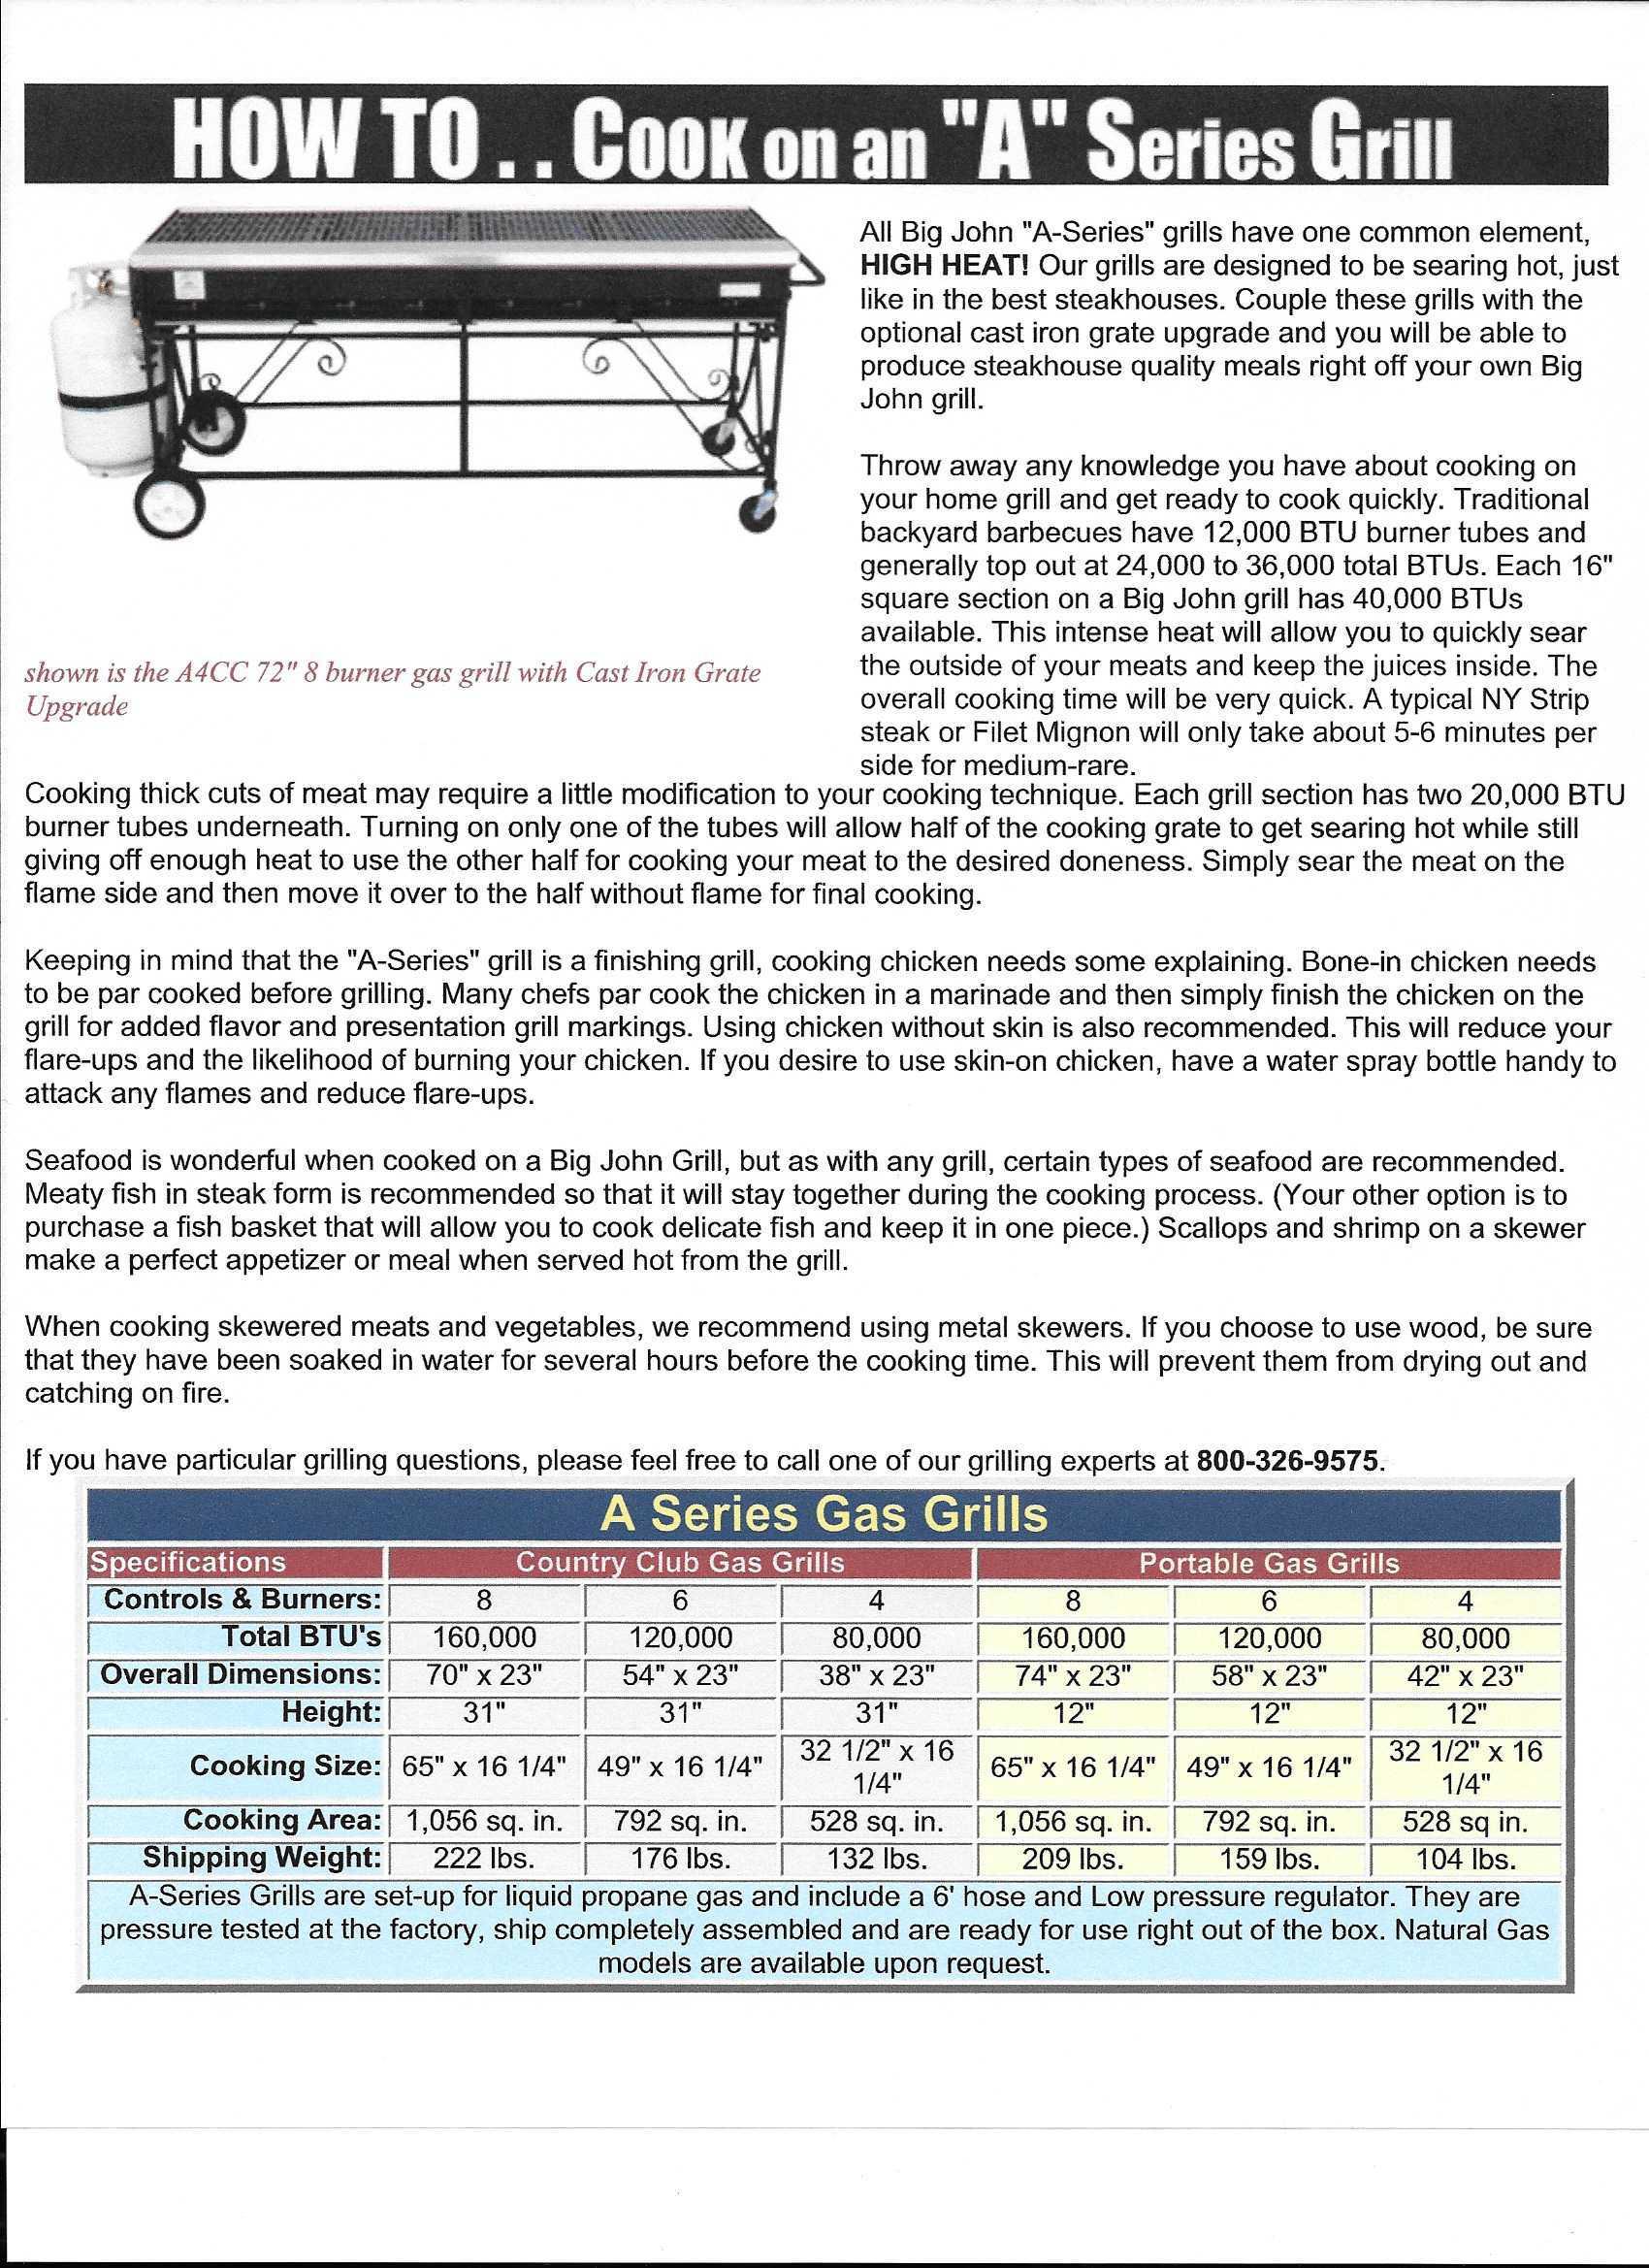 gas-grill-instructions0002.jpg